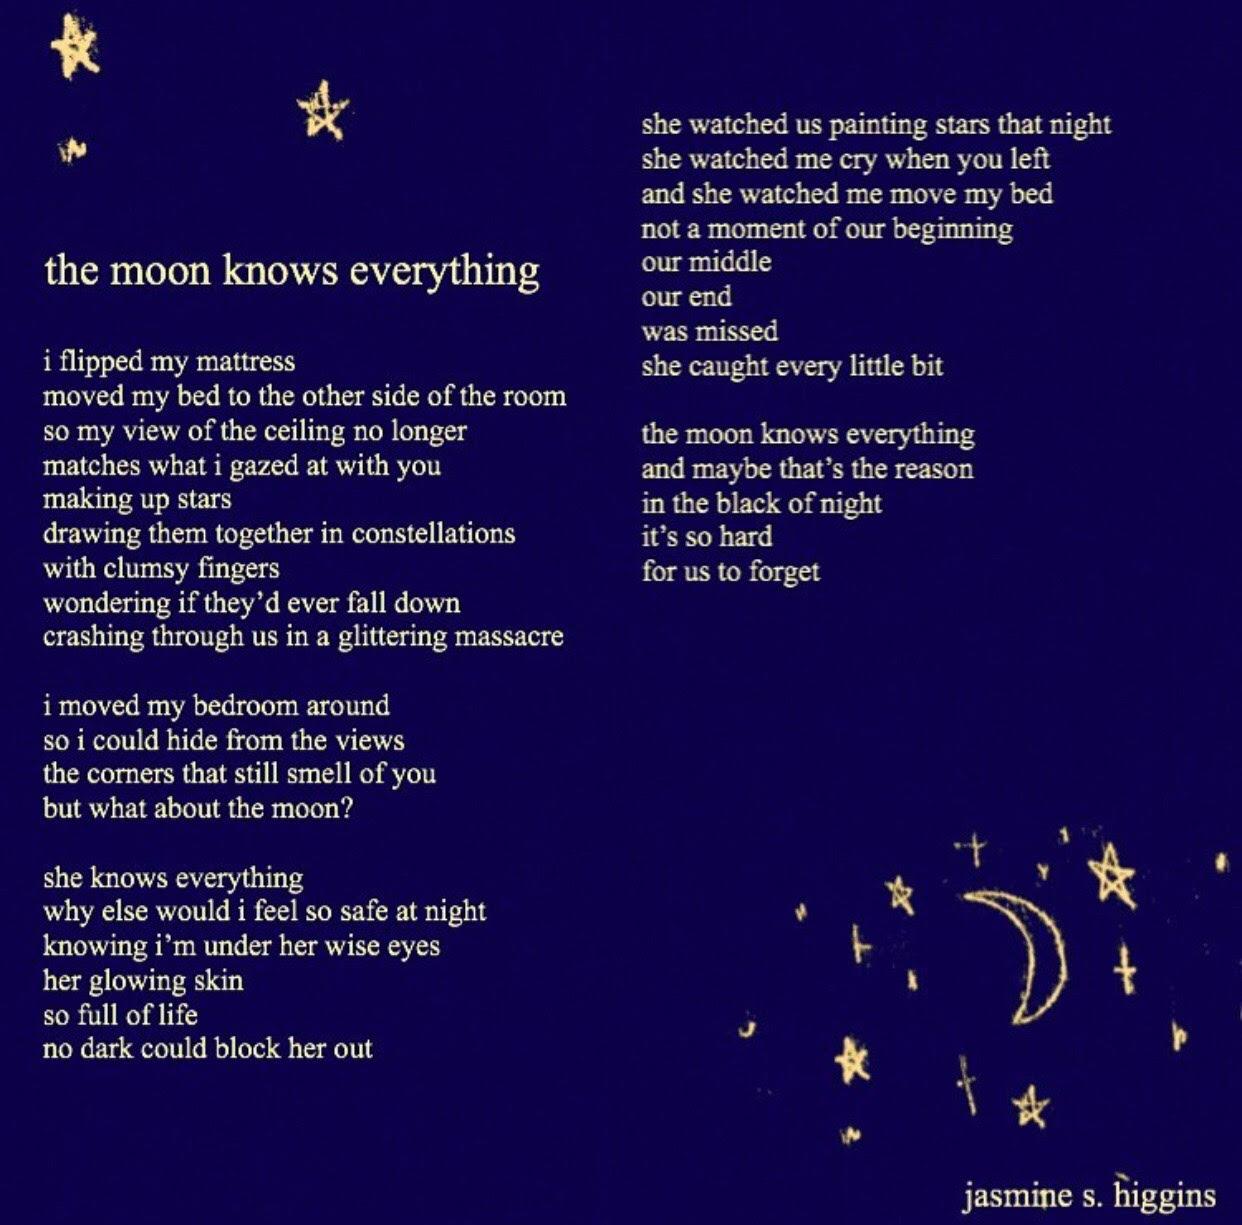 A poem written by @jasmine.s.higgins on instagram